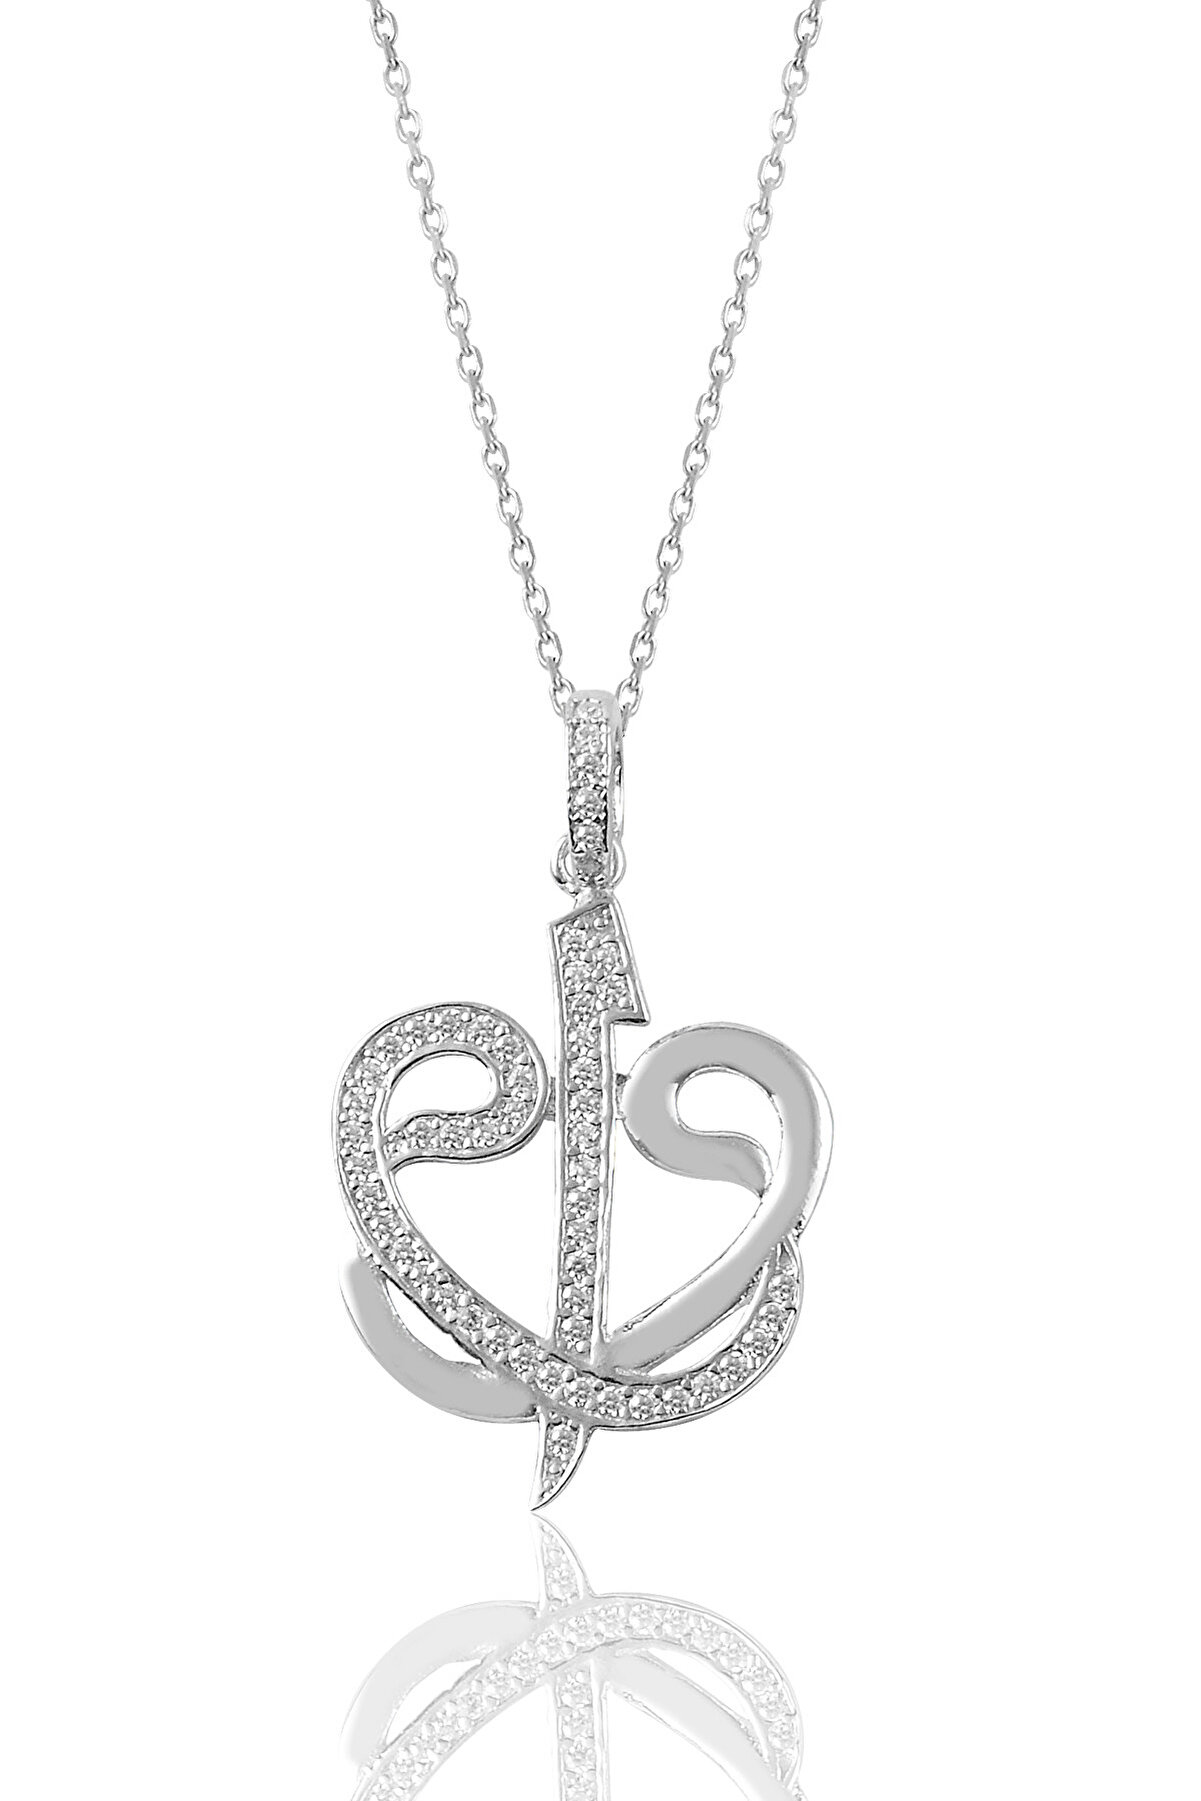 Söğütlü Silver Kadın Gümüş Zirkon Taşlı Çift Vav Ve Elif Harfi Kolye SGTL9064